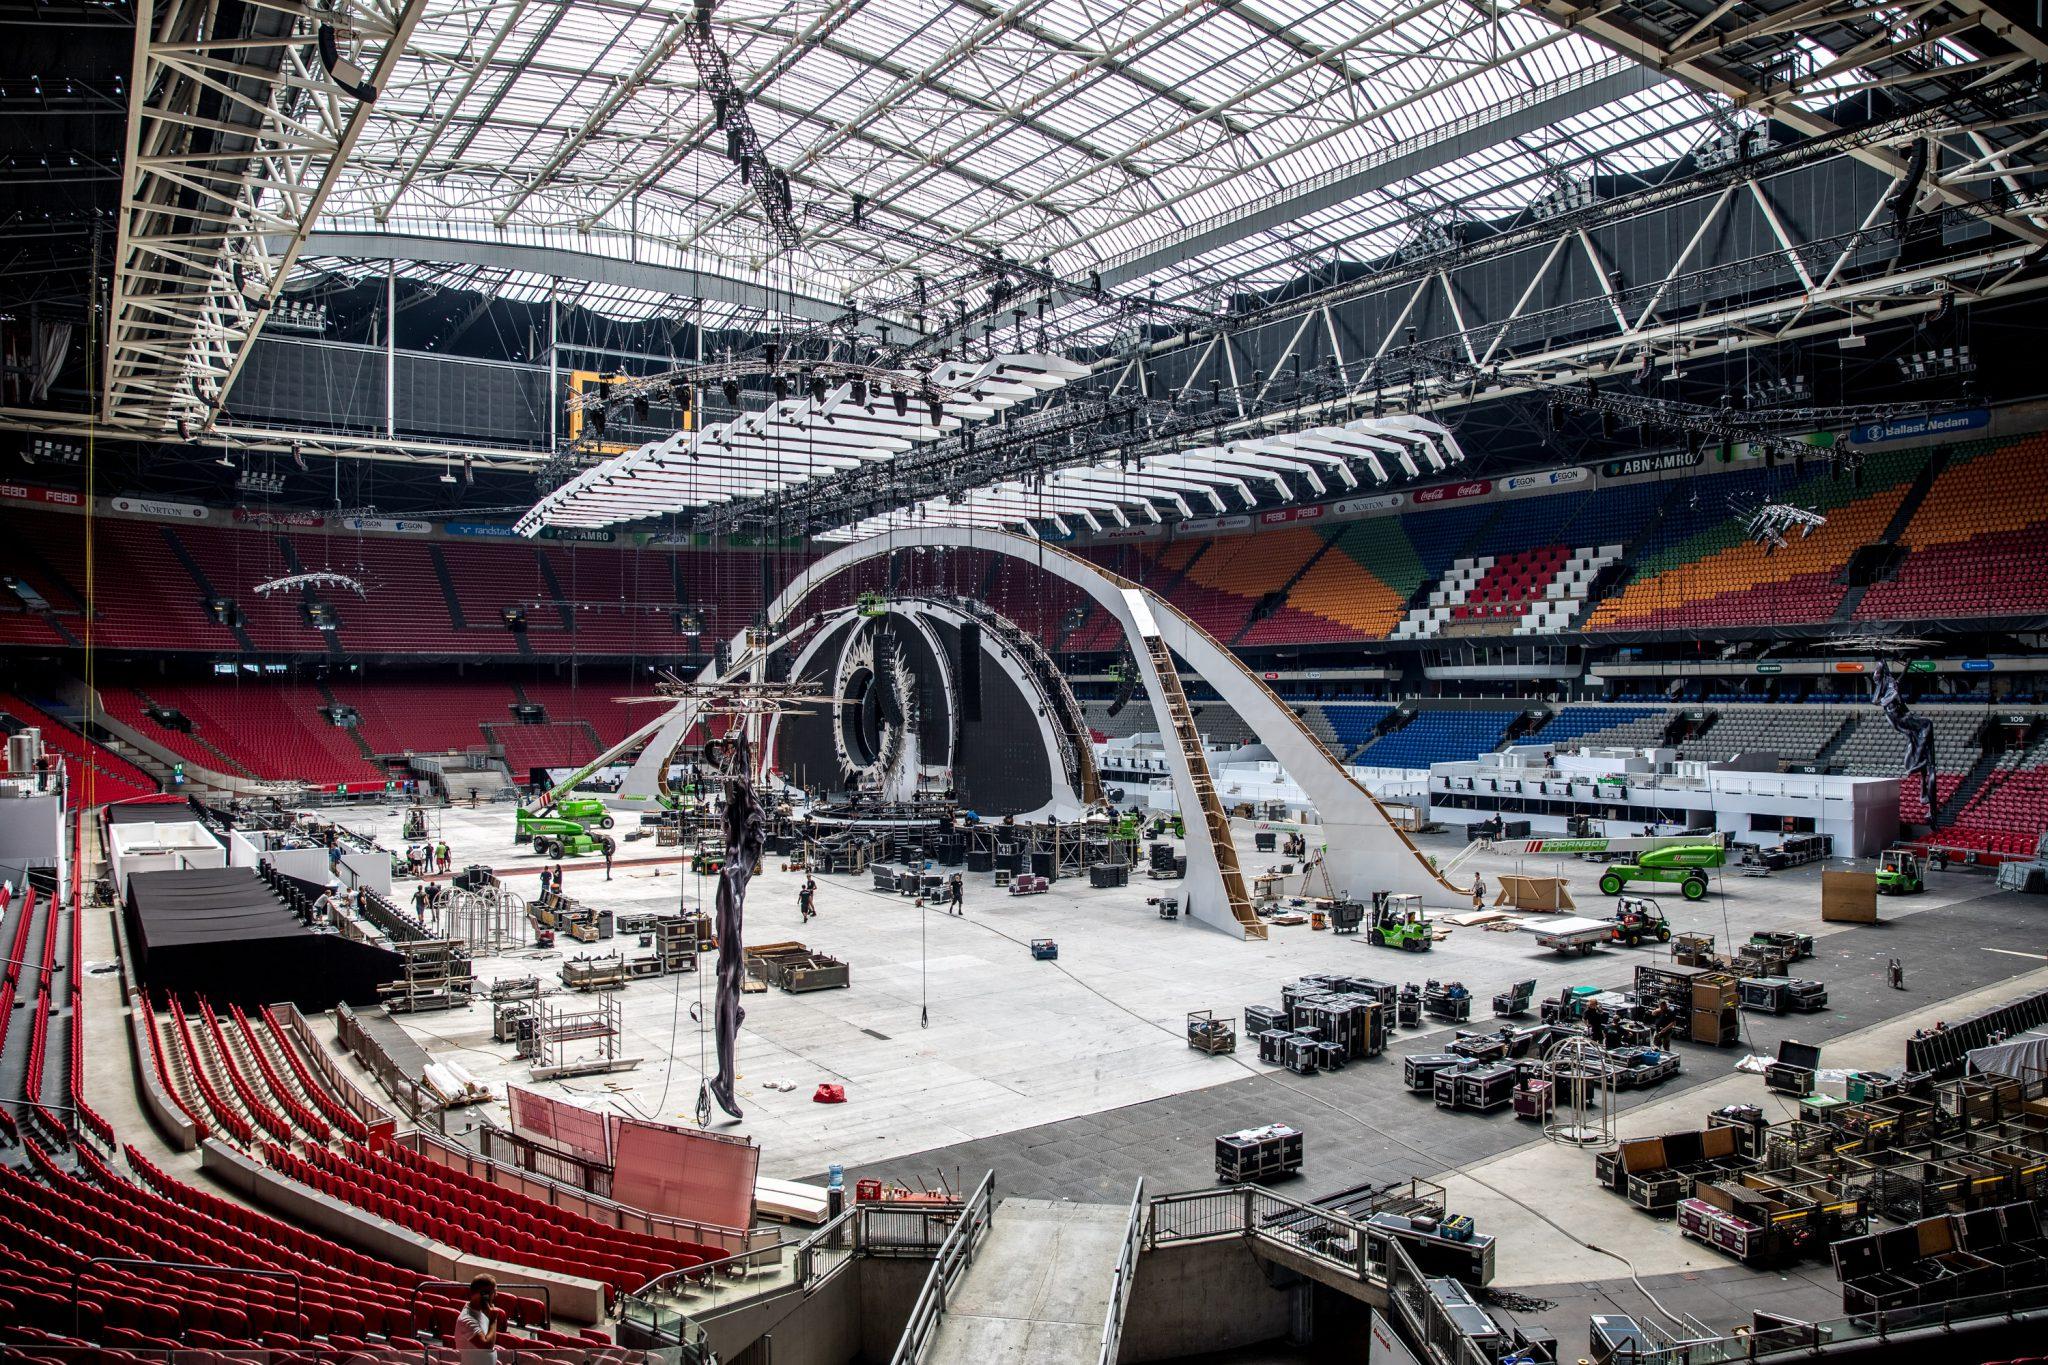 Sensation Amsterdam 'The Final'